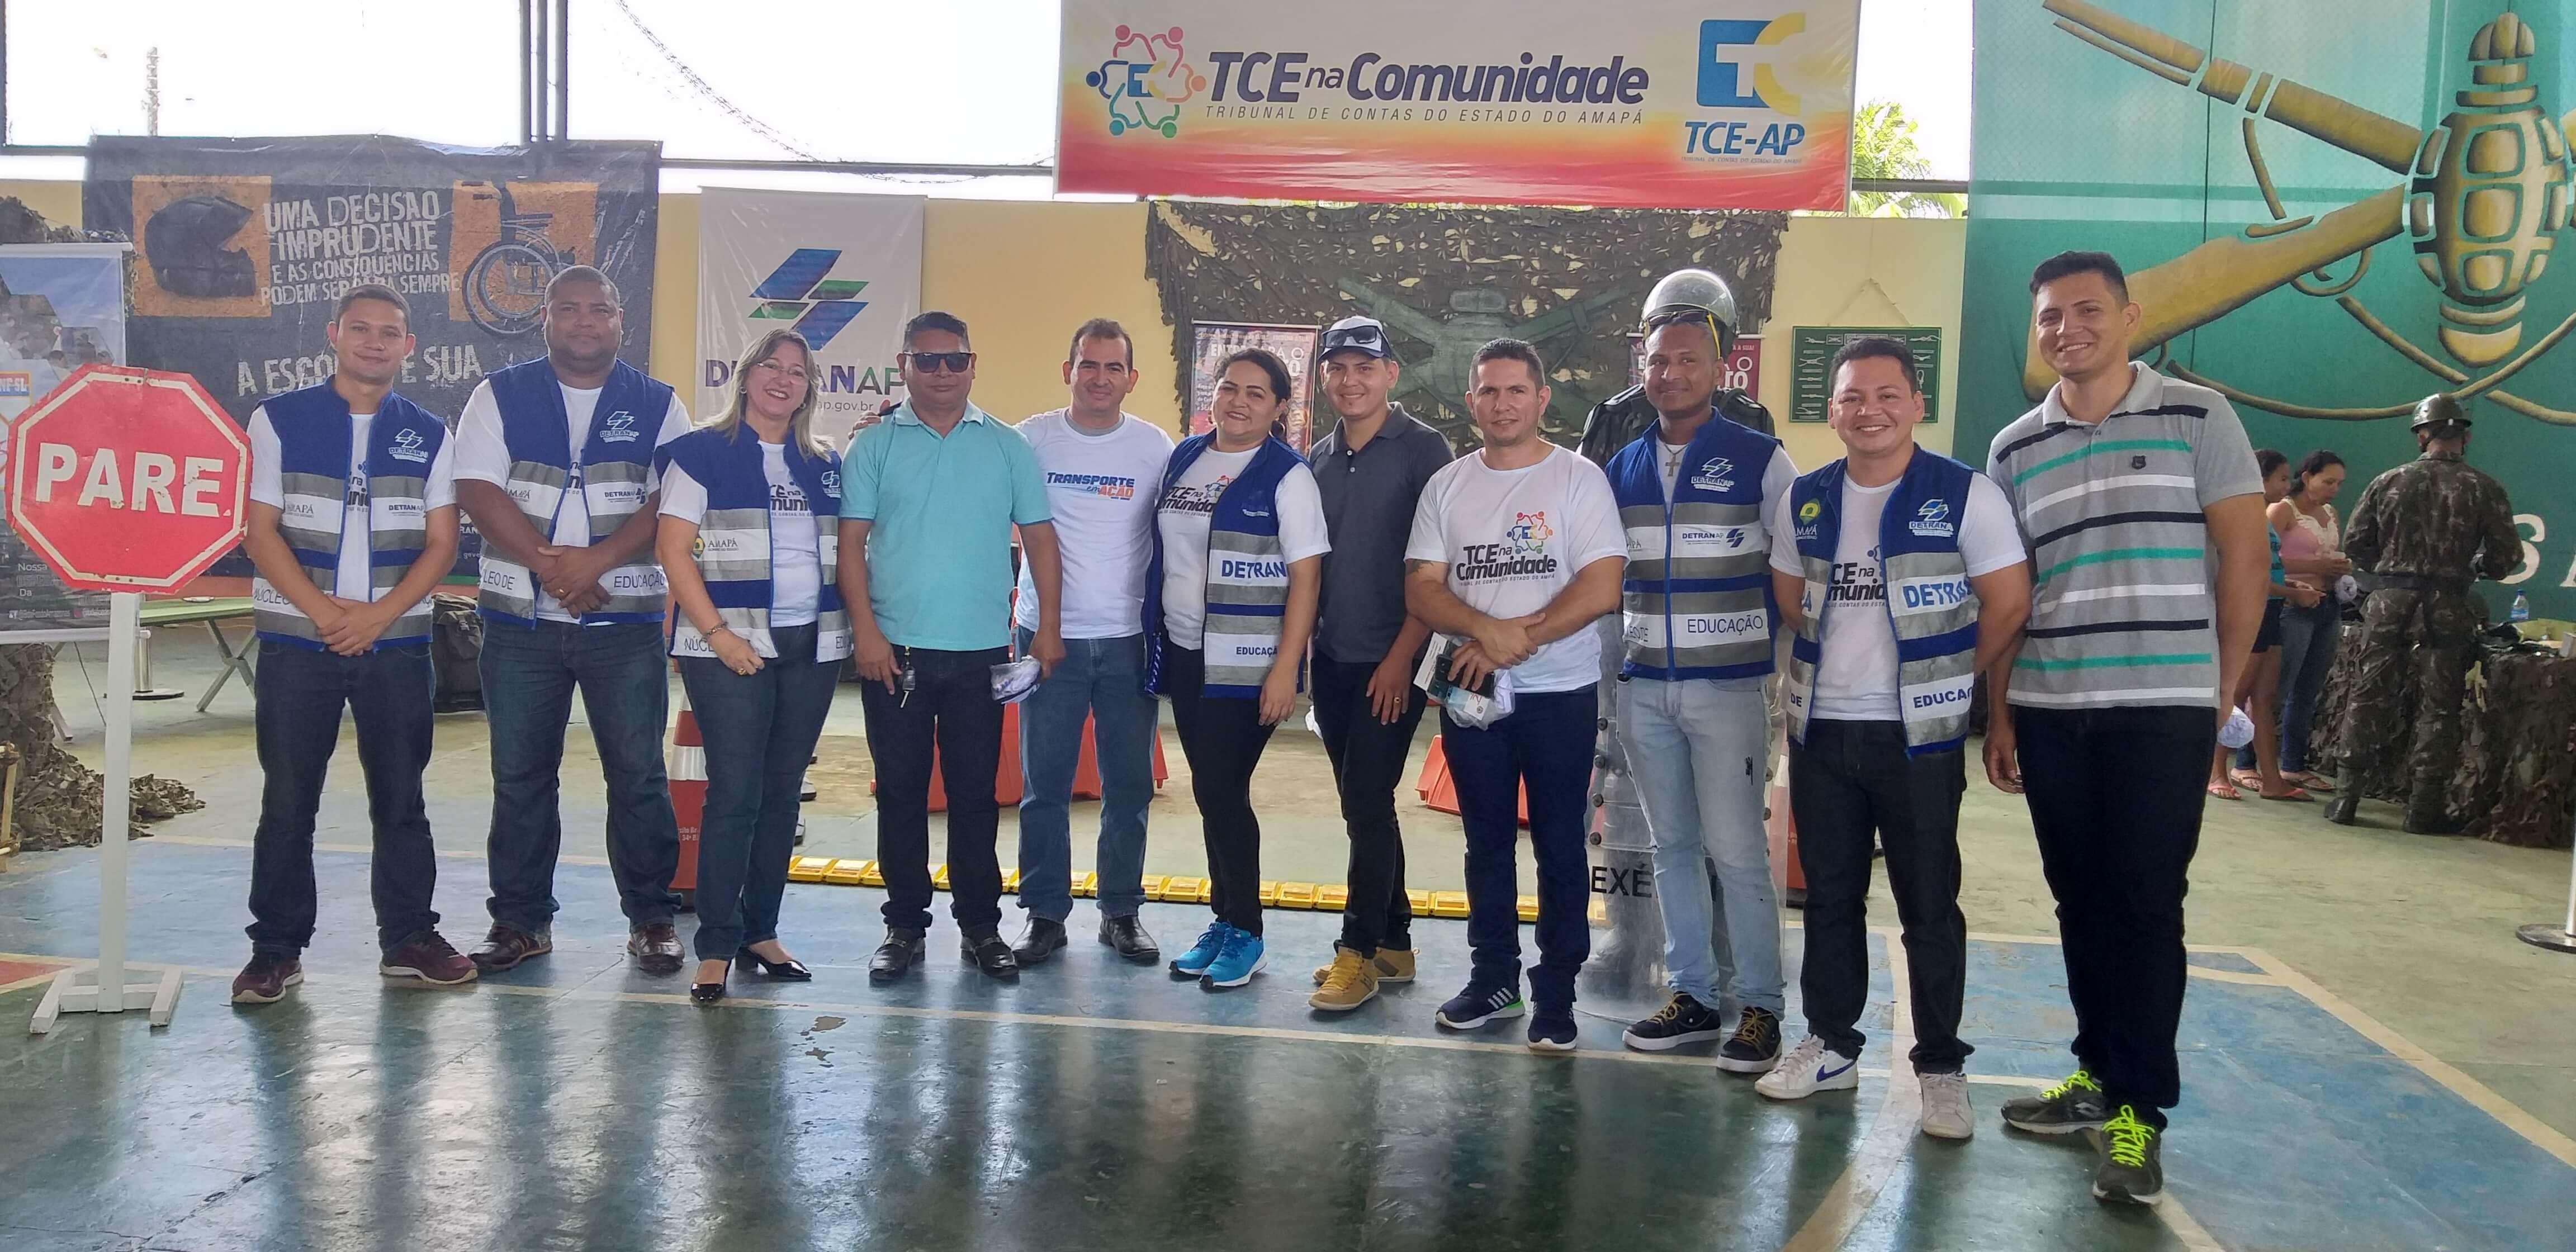 Detran e TCE na Comunidade no município de Porto Grande